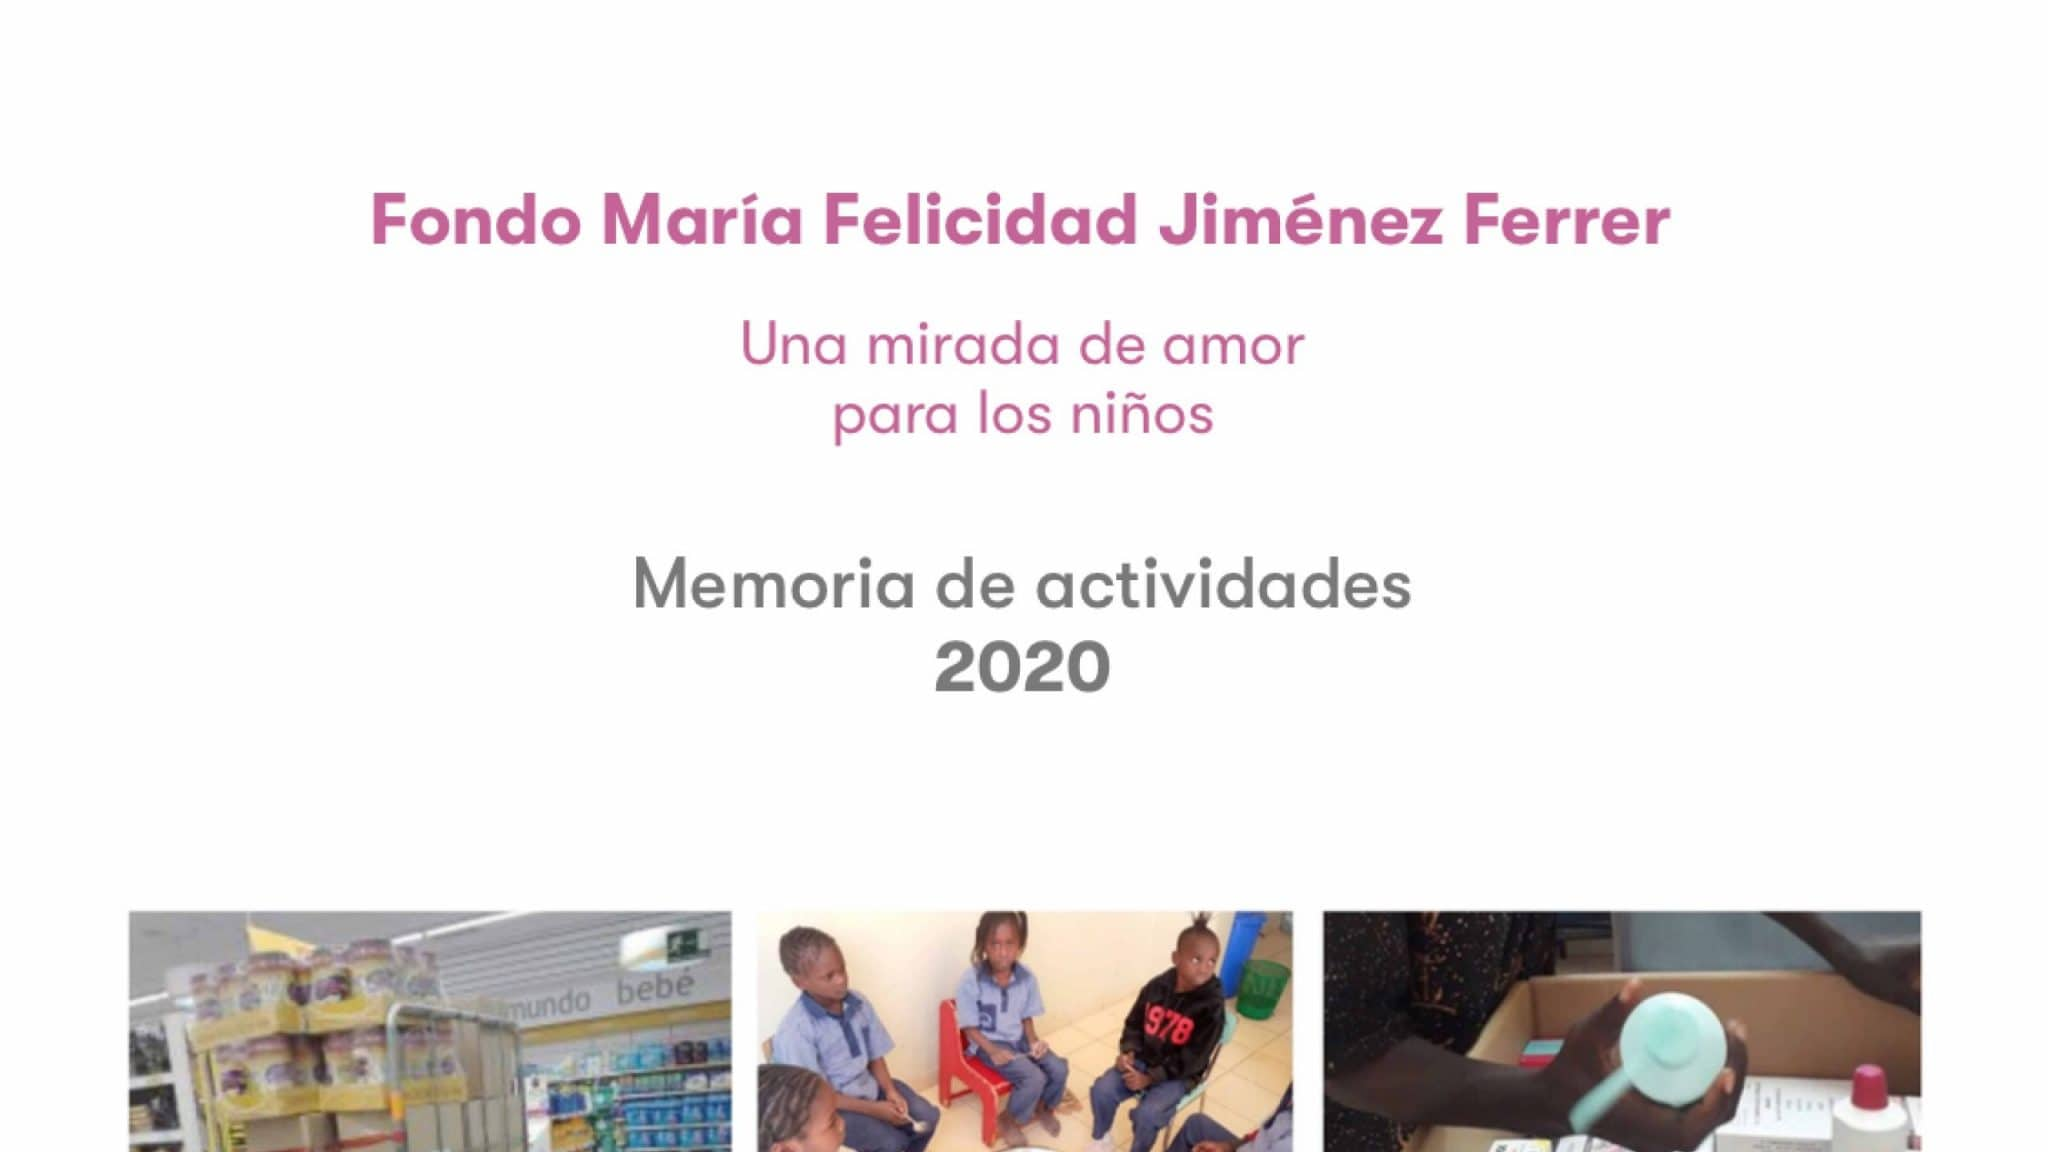 Memoria de actividades del 2020